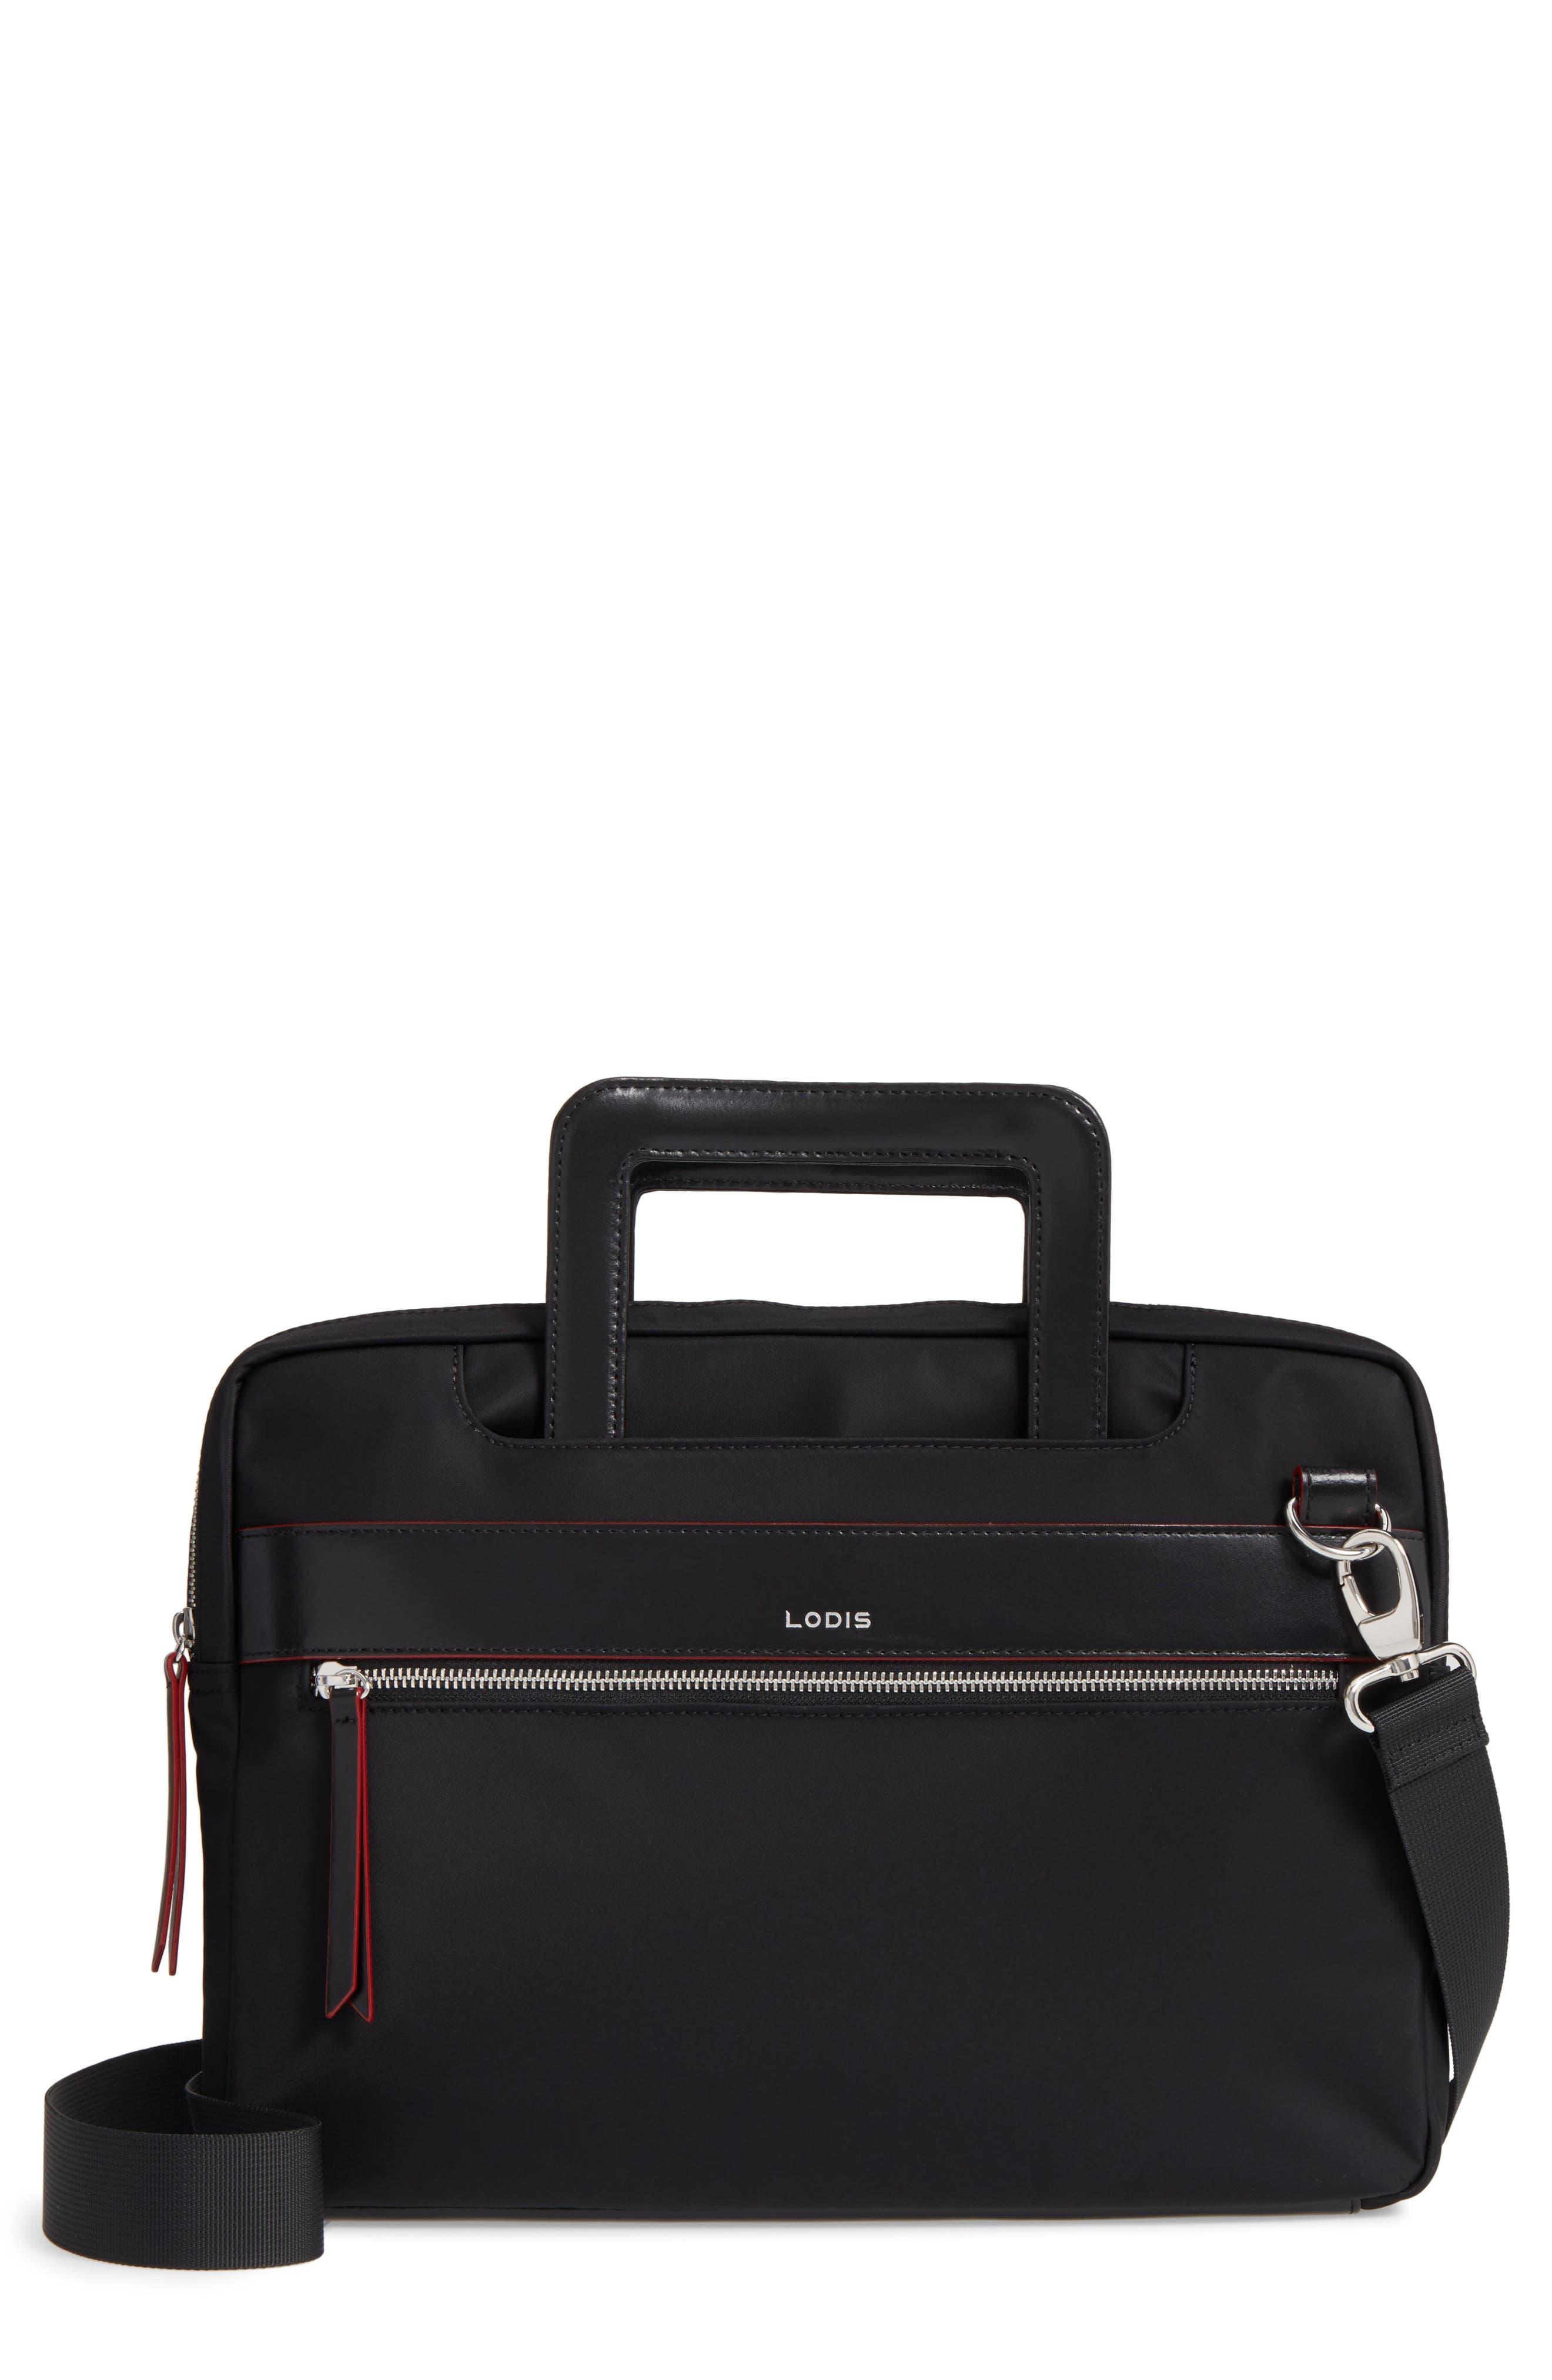 Main Image - Lodis Kate Under Lock & Key Cora Laptop Crossbody Bag